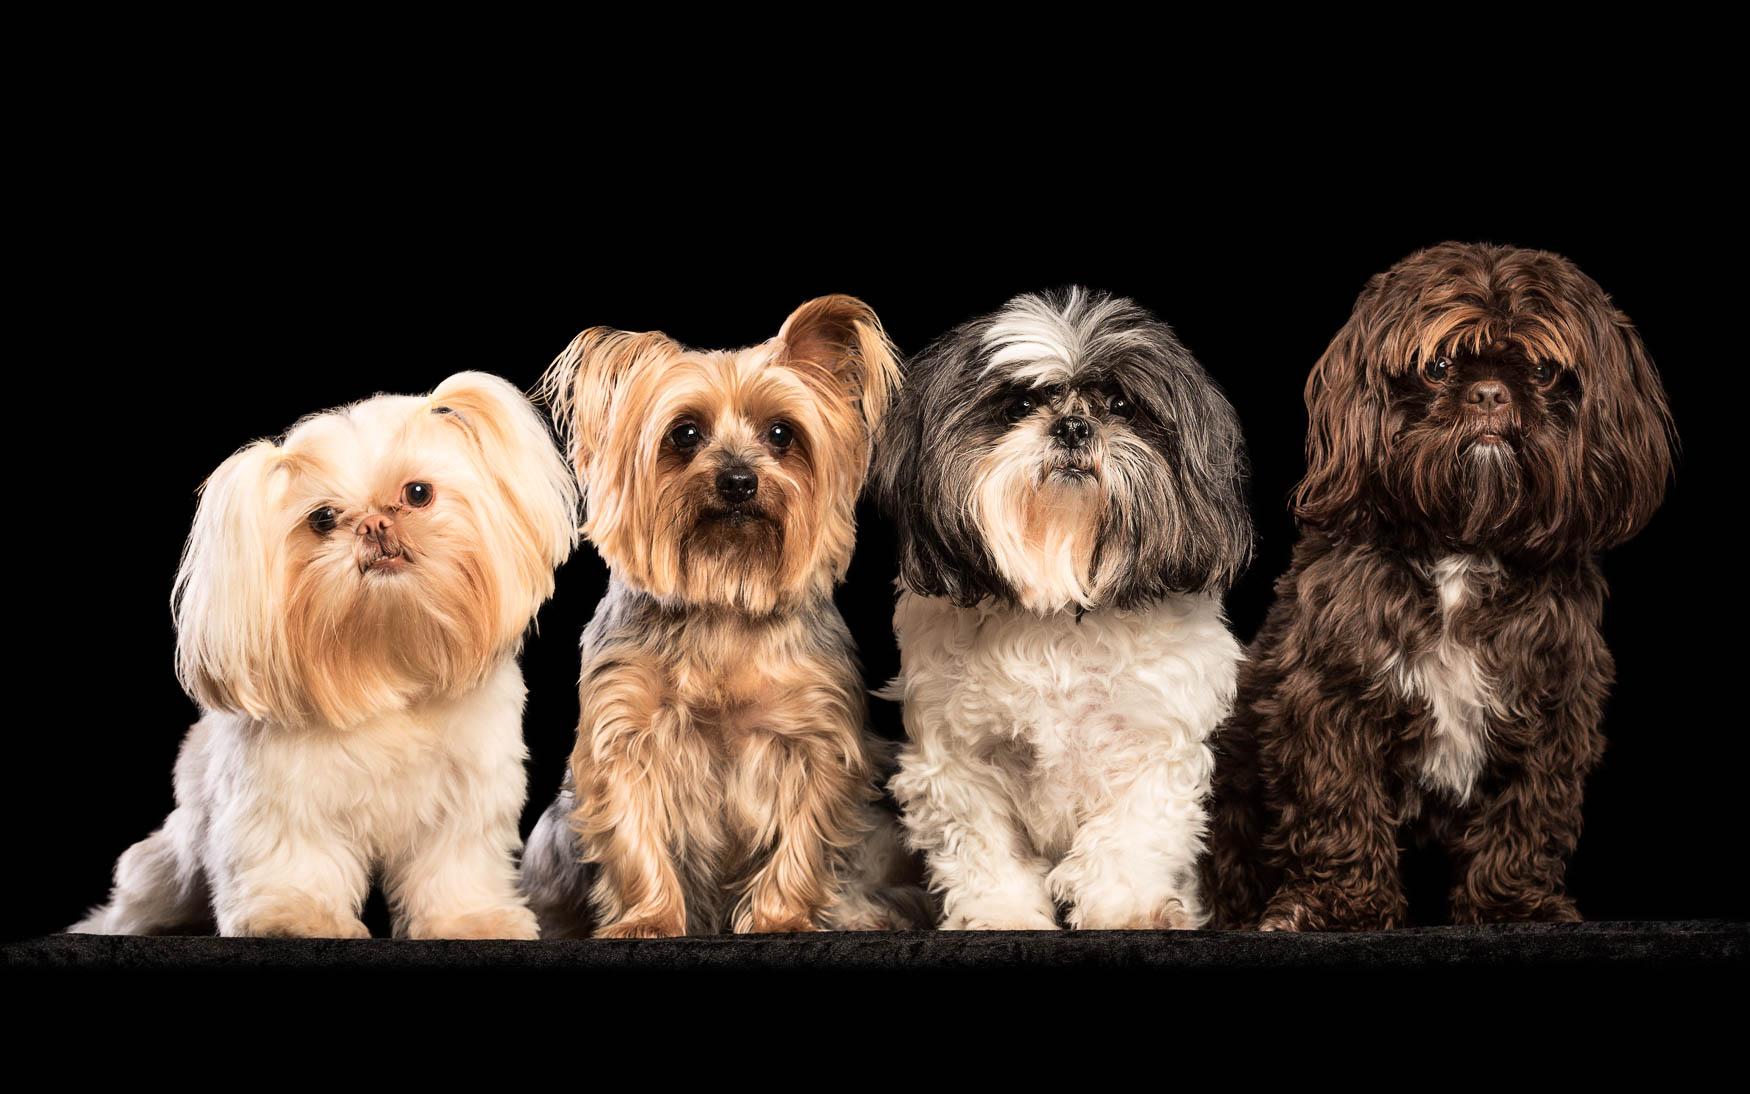 Fine art studio dog photographer North Wales - Shitzhus